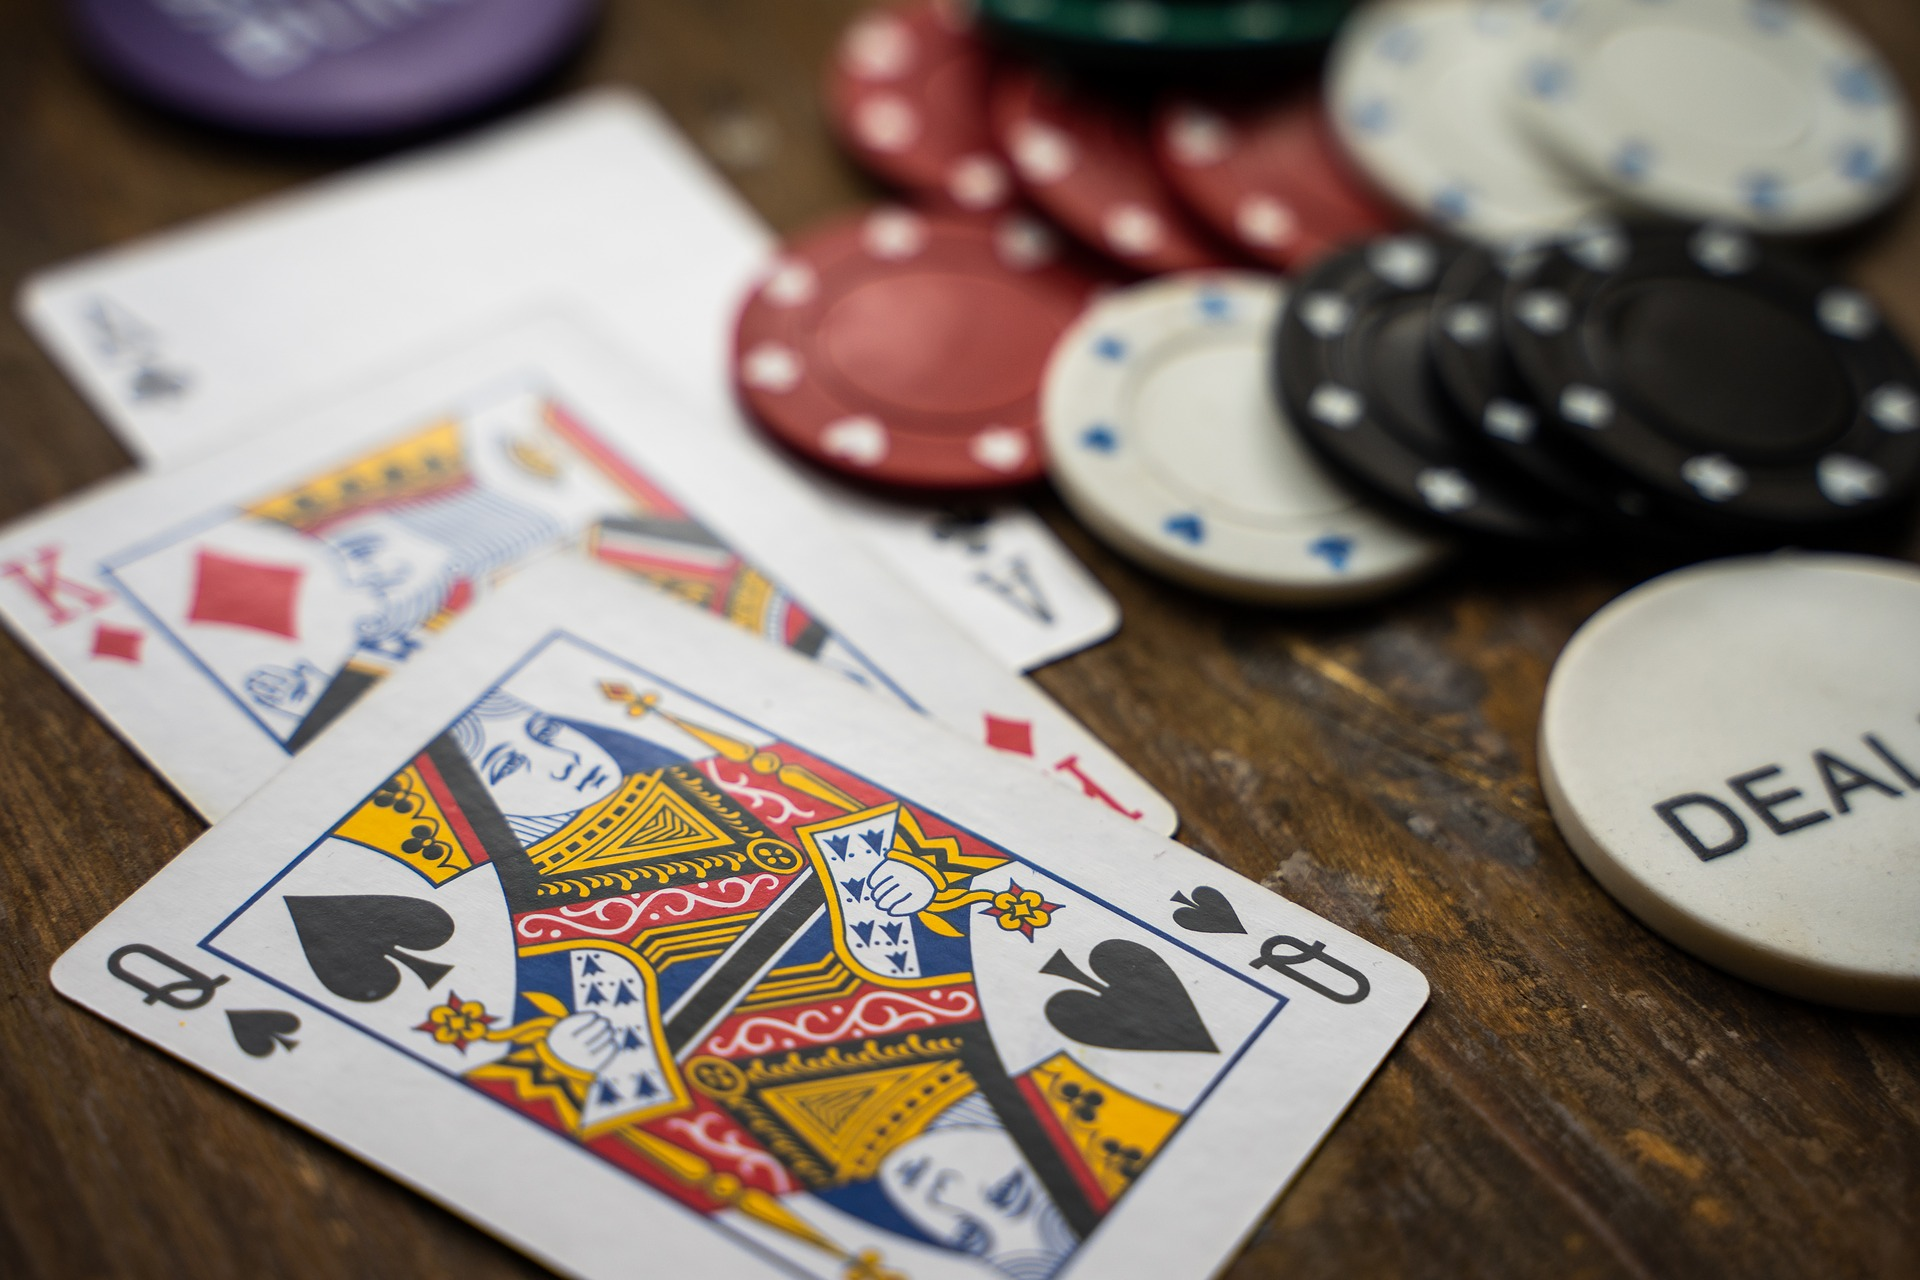 gambling-4178458_1920.jpg